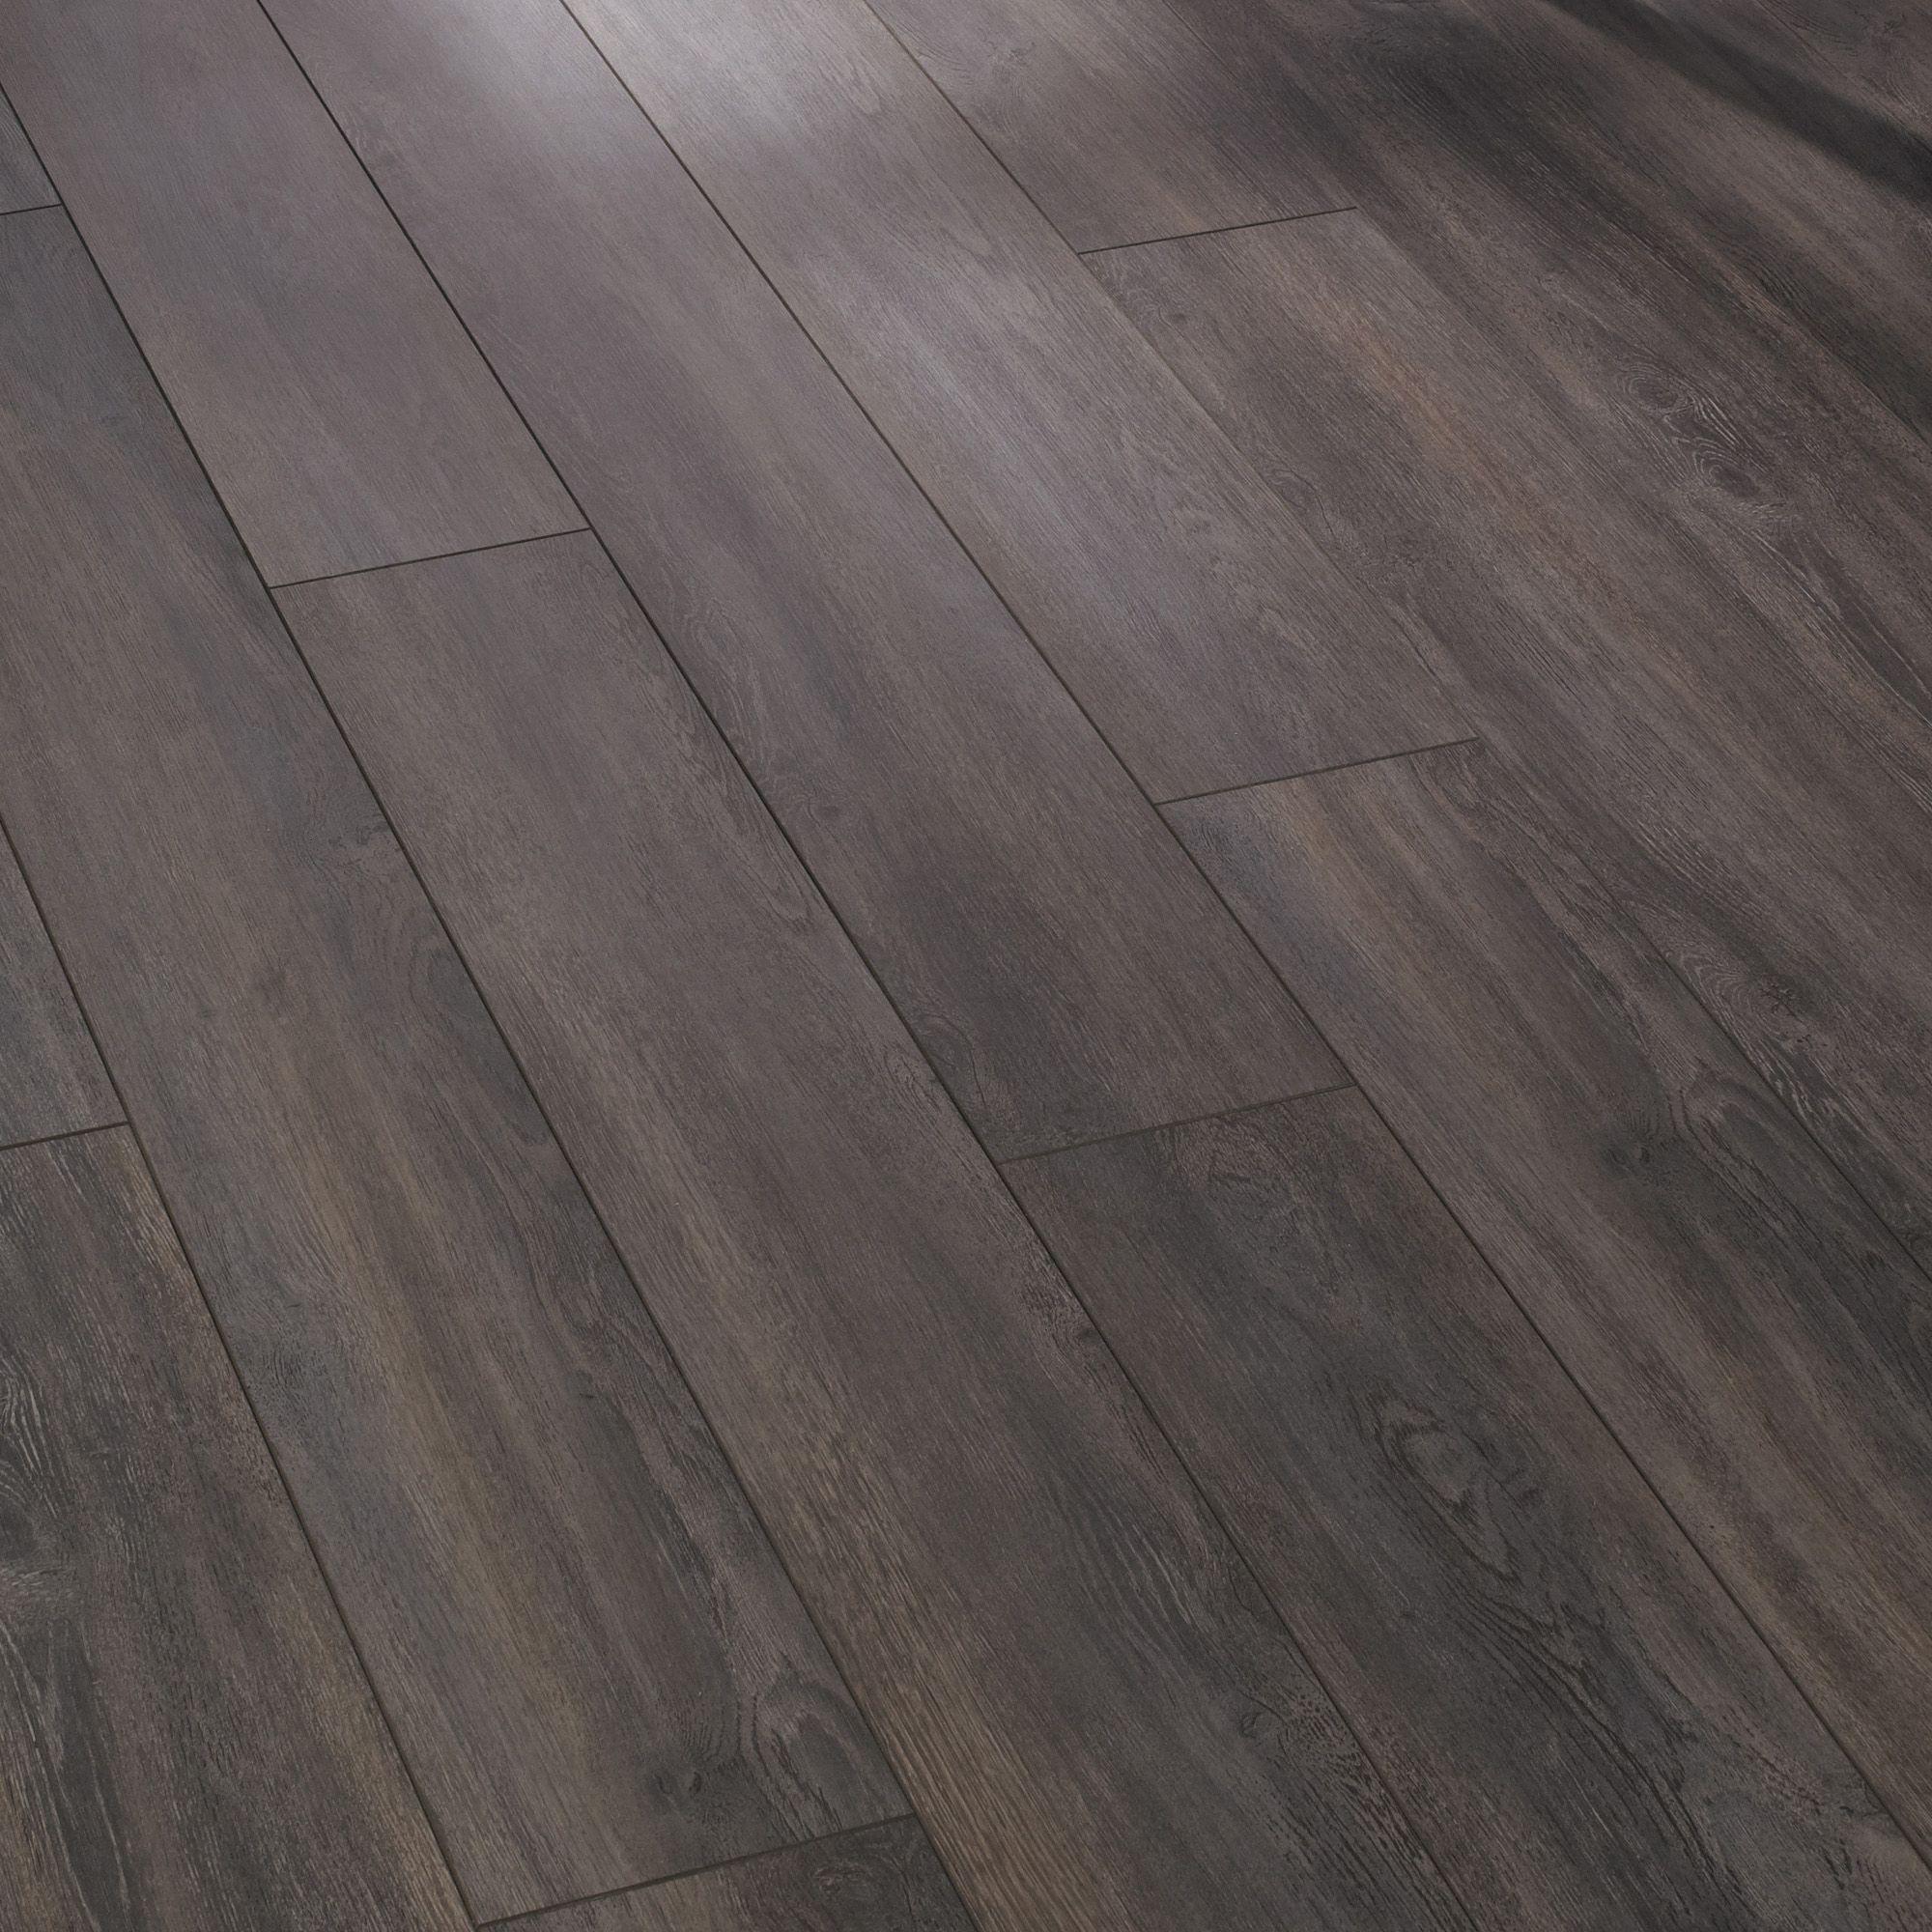 Belcanto Natural Seville Spruce Effect Laminate Flooring 1 99 M² Sample Departments Diy At B Q